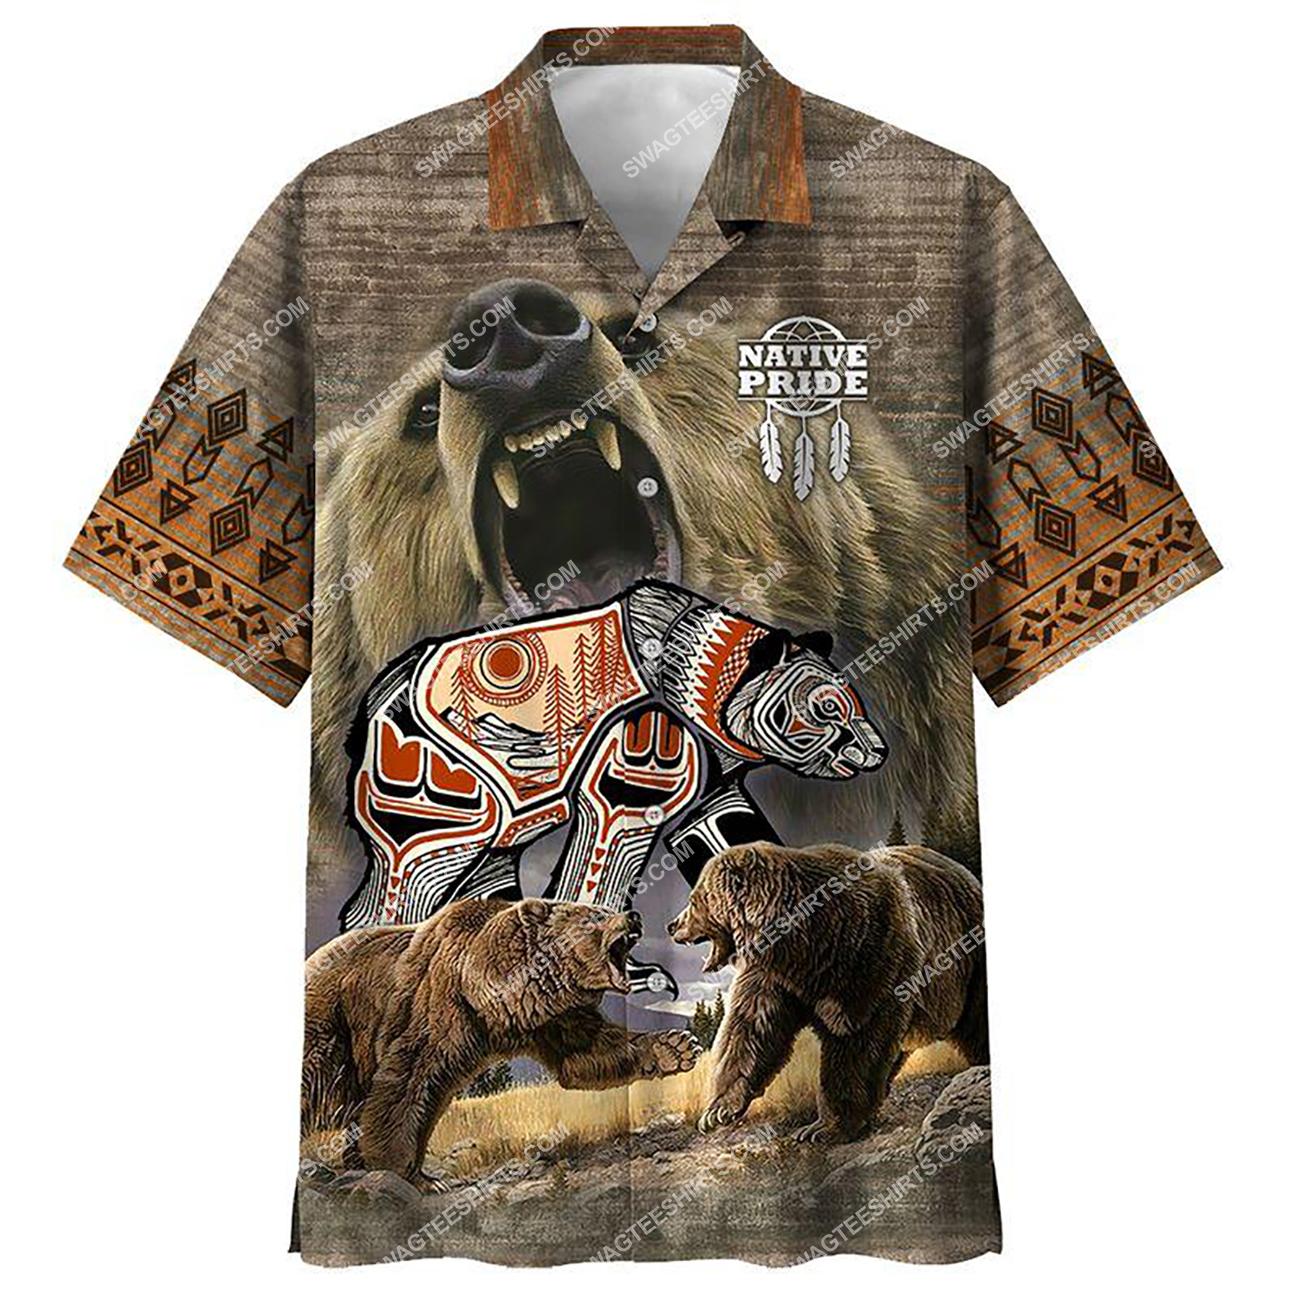 vintage native american native pride all over printed hawaiian shirt 1(1)